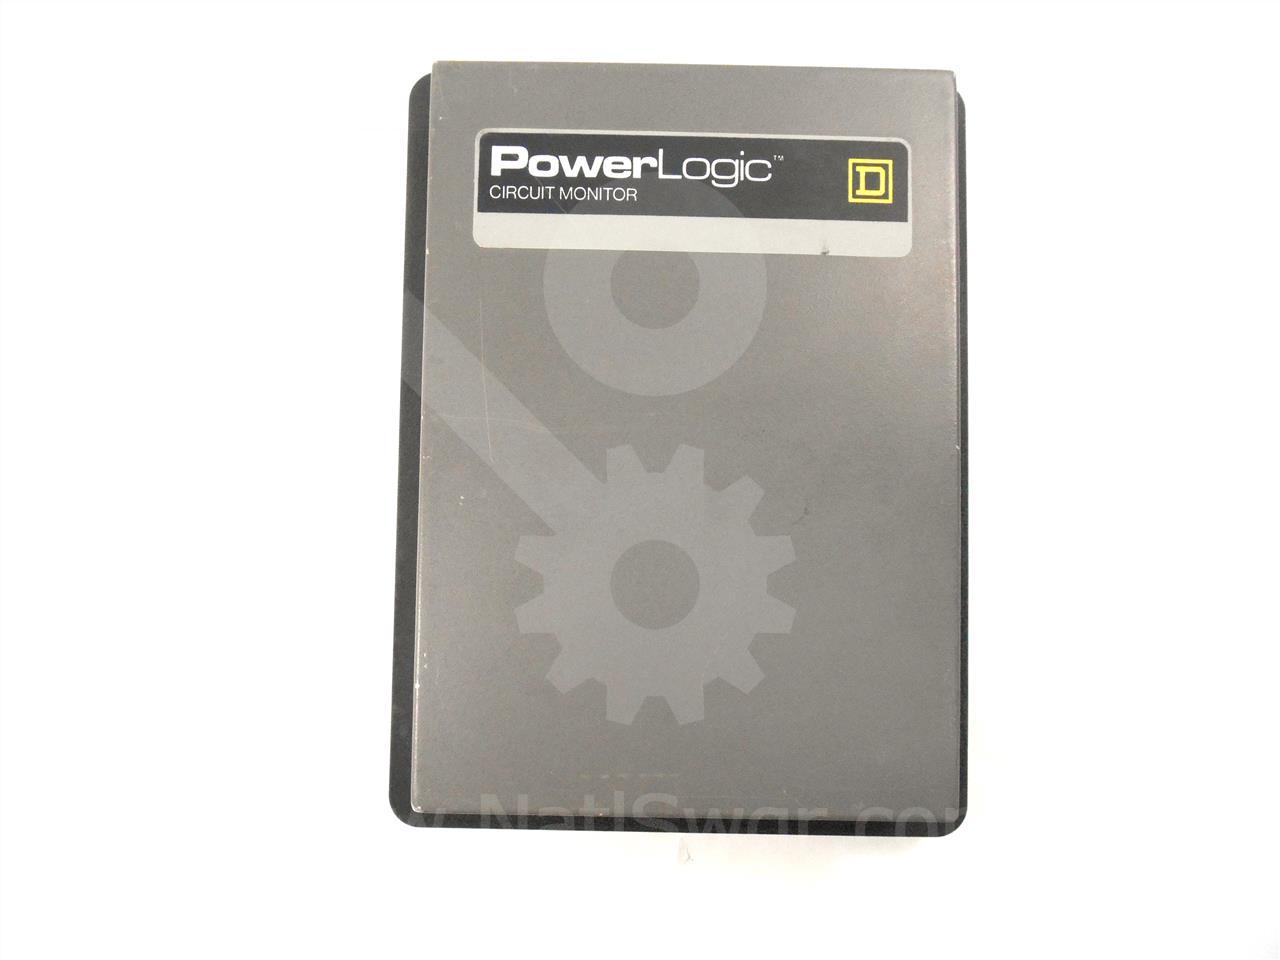 Square D Sqd Powerlogic Cm 108 Circuit Monitor